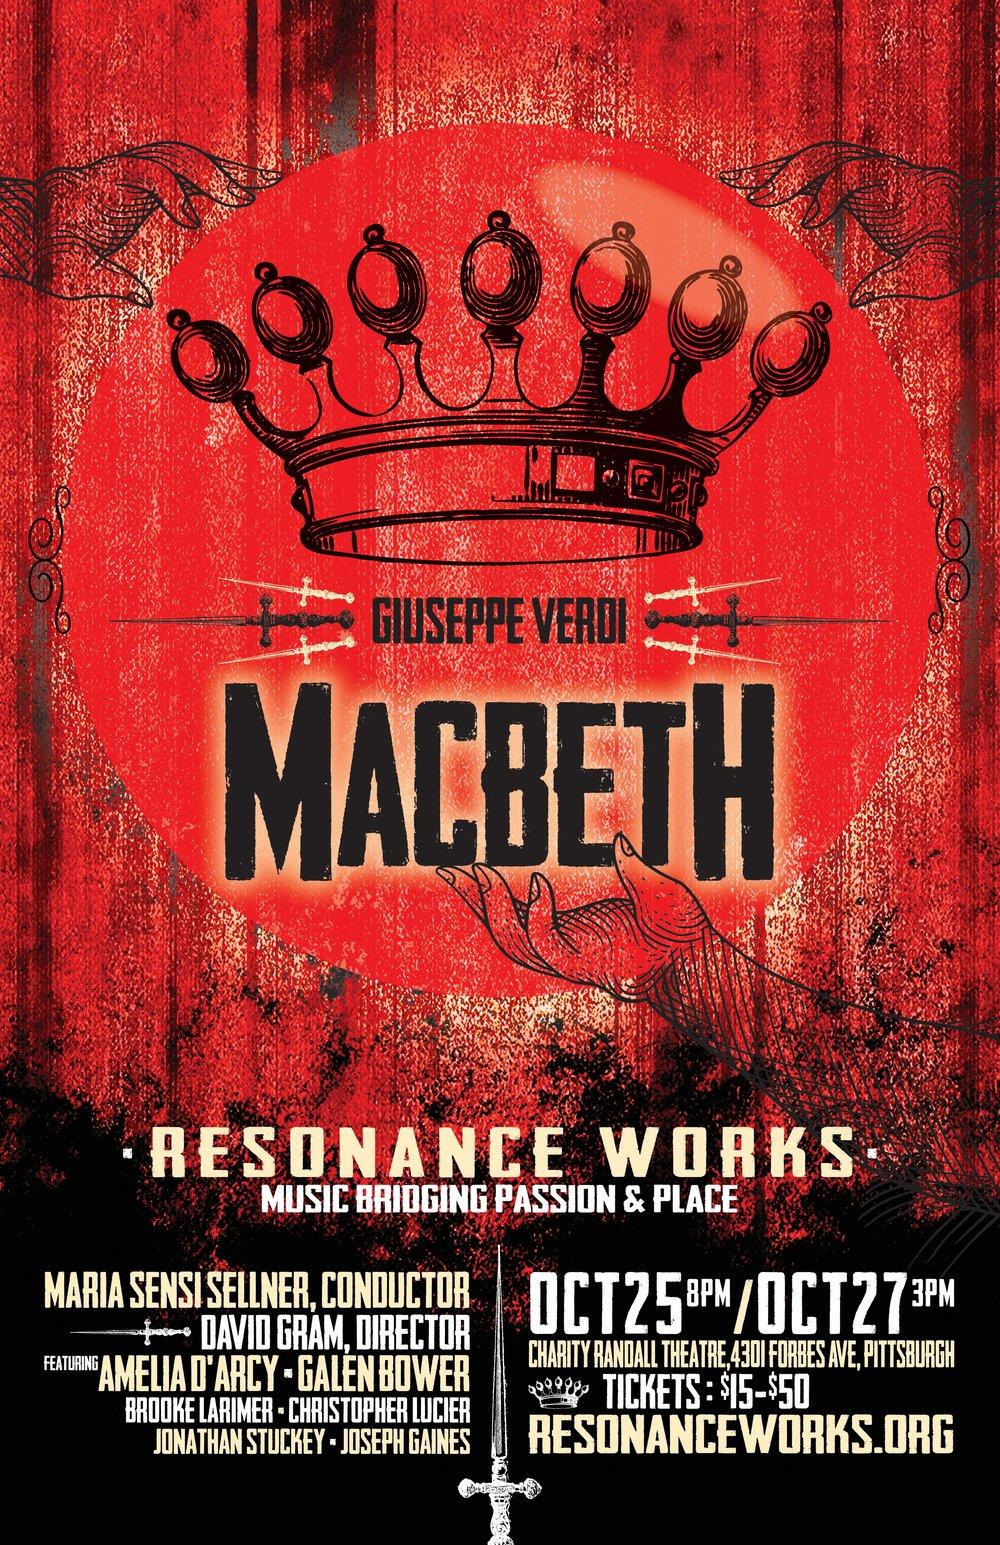 resonance_macbeth_11x17.jpg